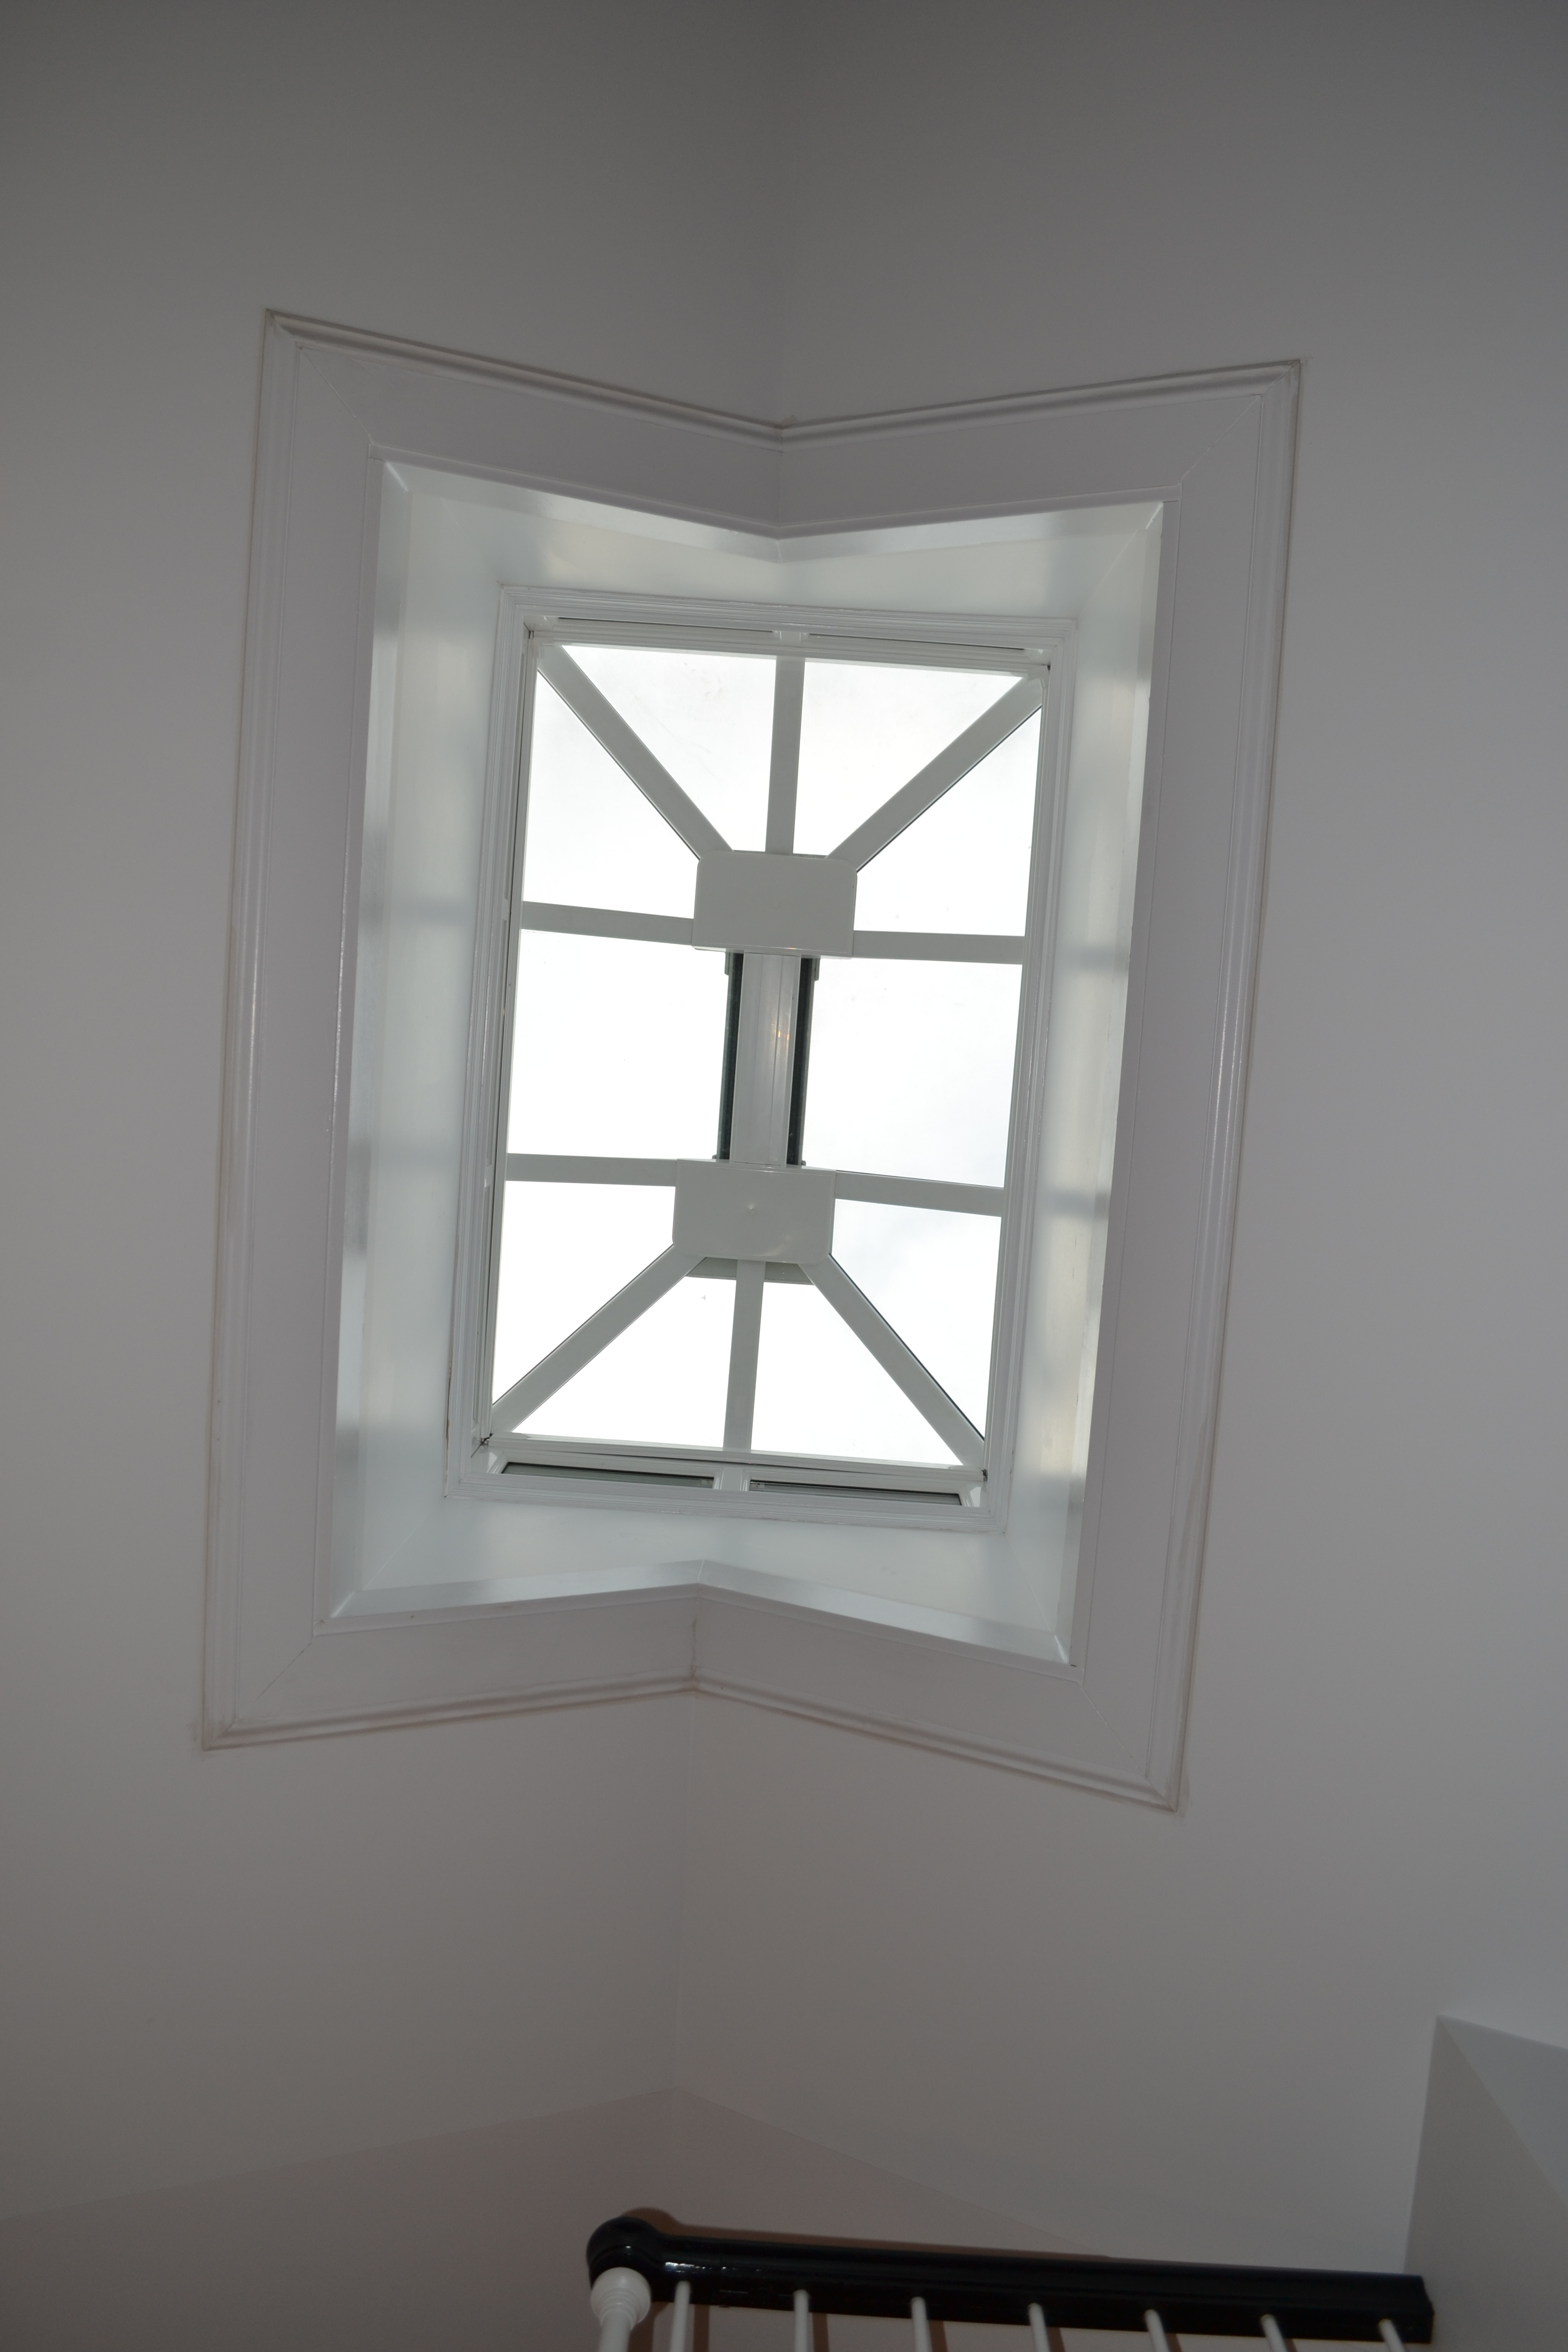 cupola skylight